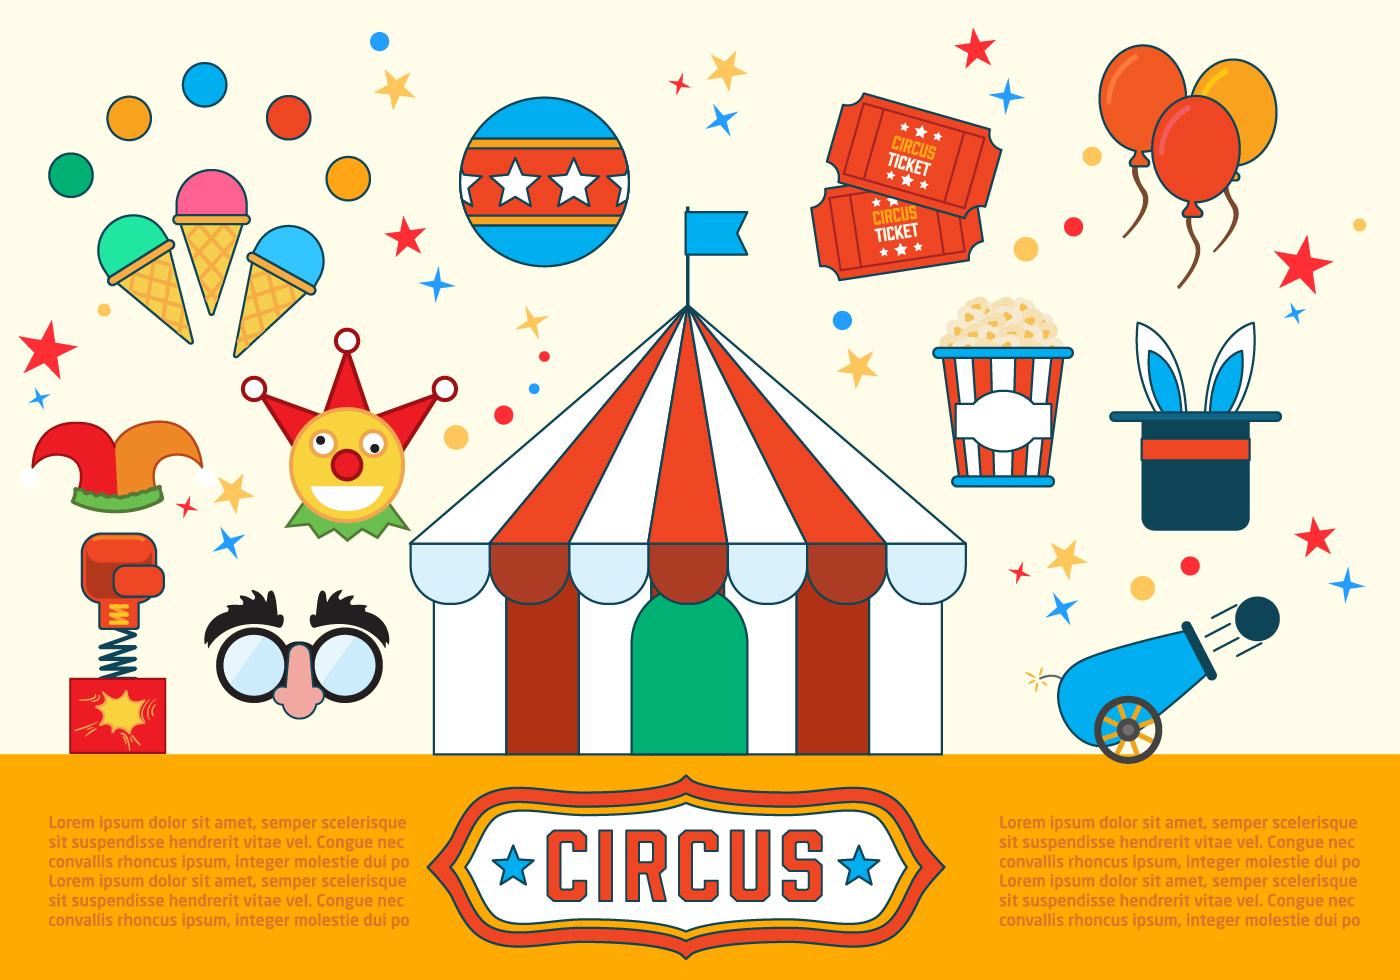 Circus Free Vector Art - (547 Free Downloads)